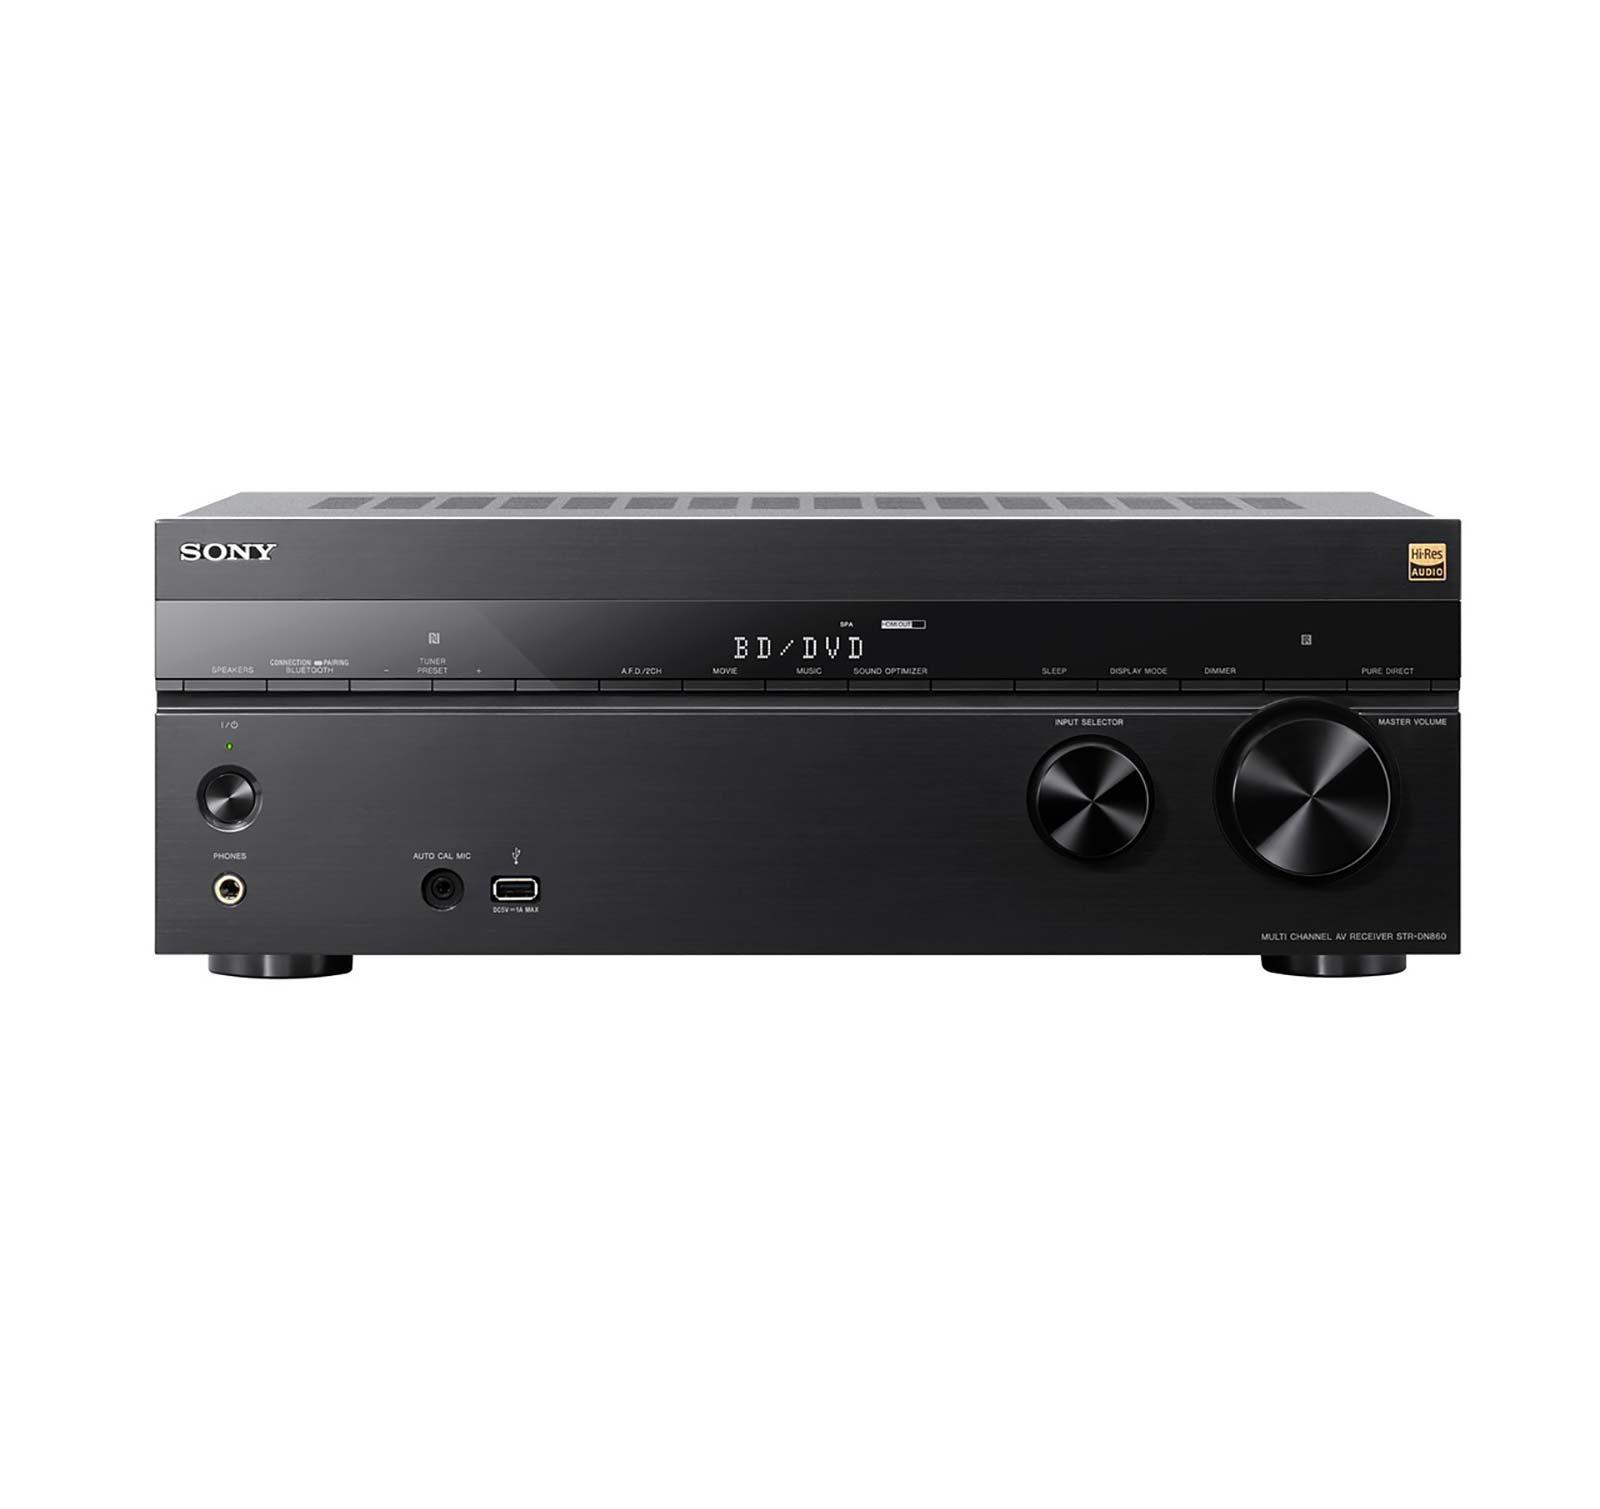 Sony Sony STR-DN860 - Open Box 7.2 Home Theater AV Receiver